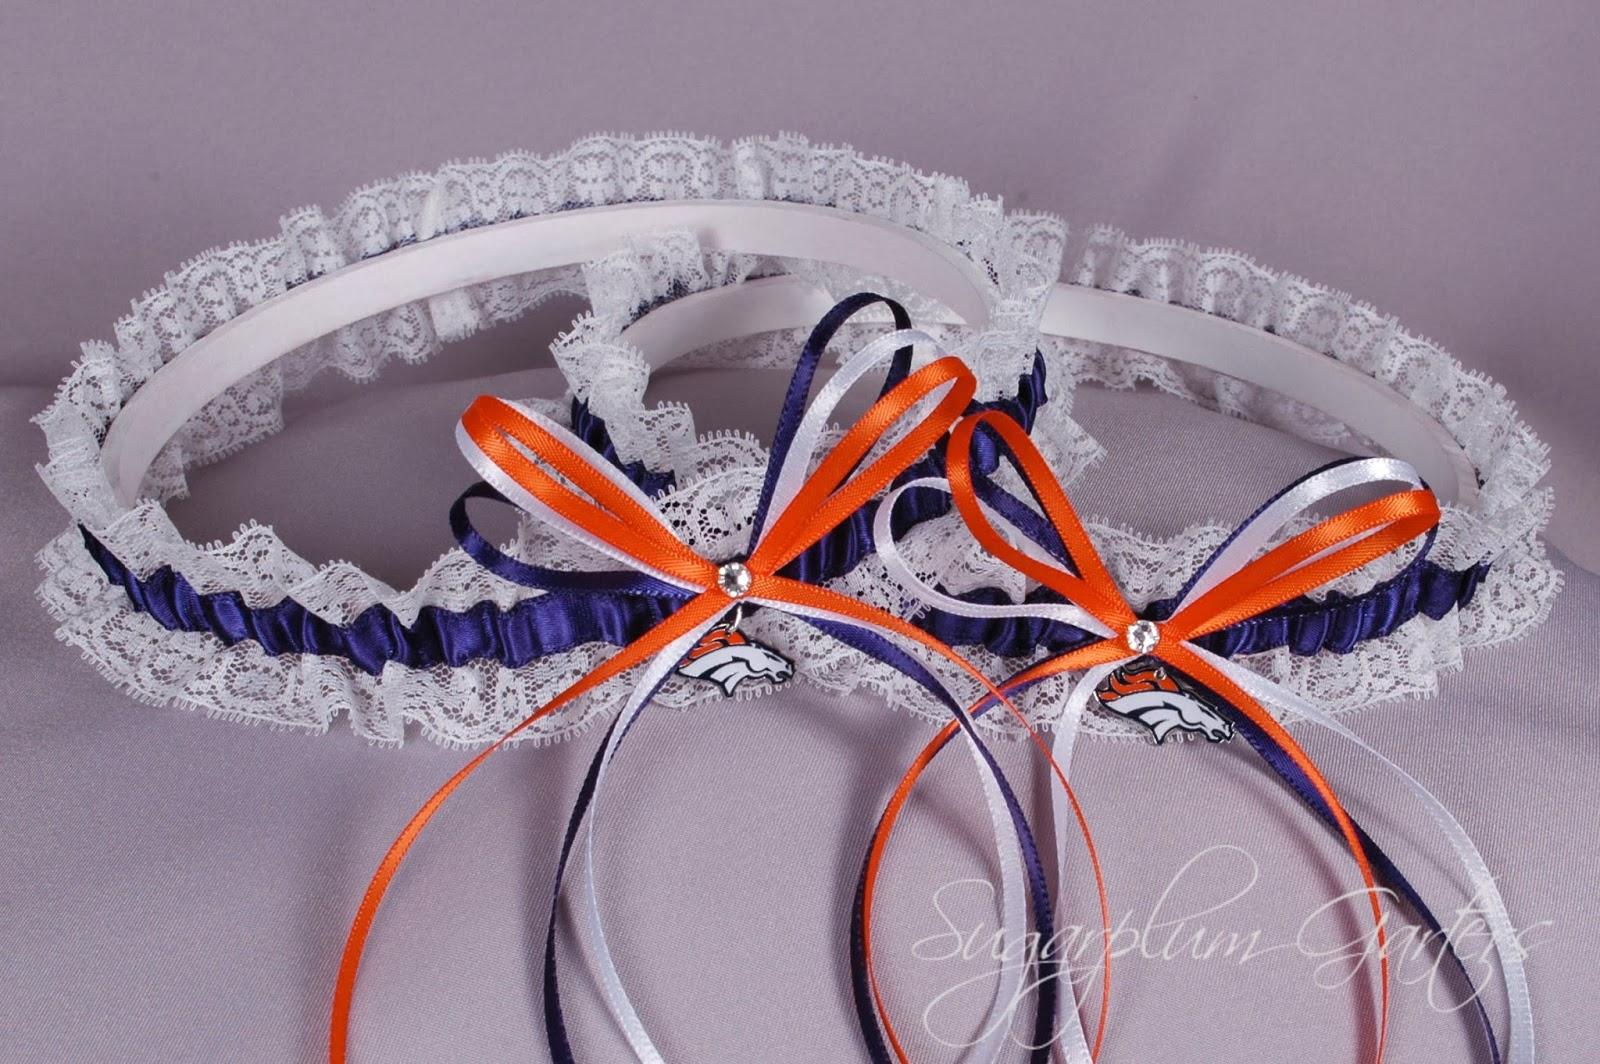 Denver Broncos Lace Garter Set by Sugarplum Garters